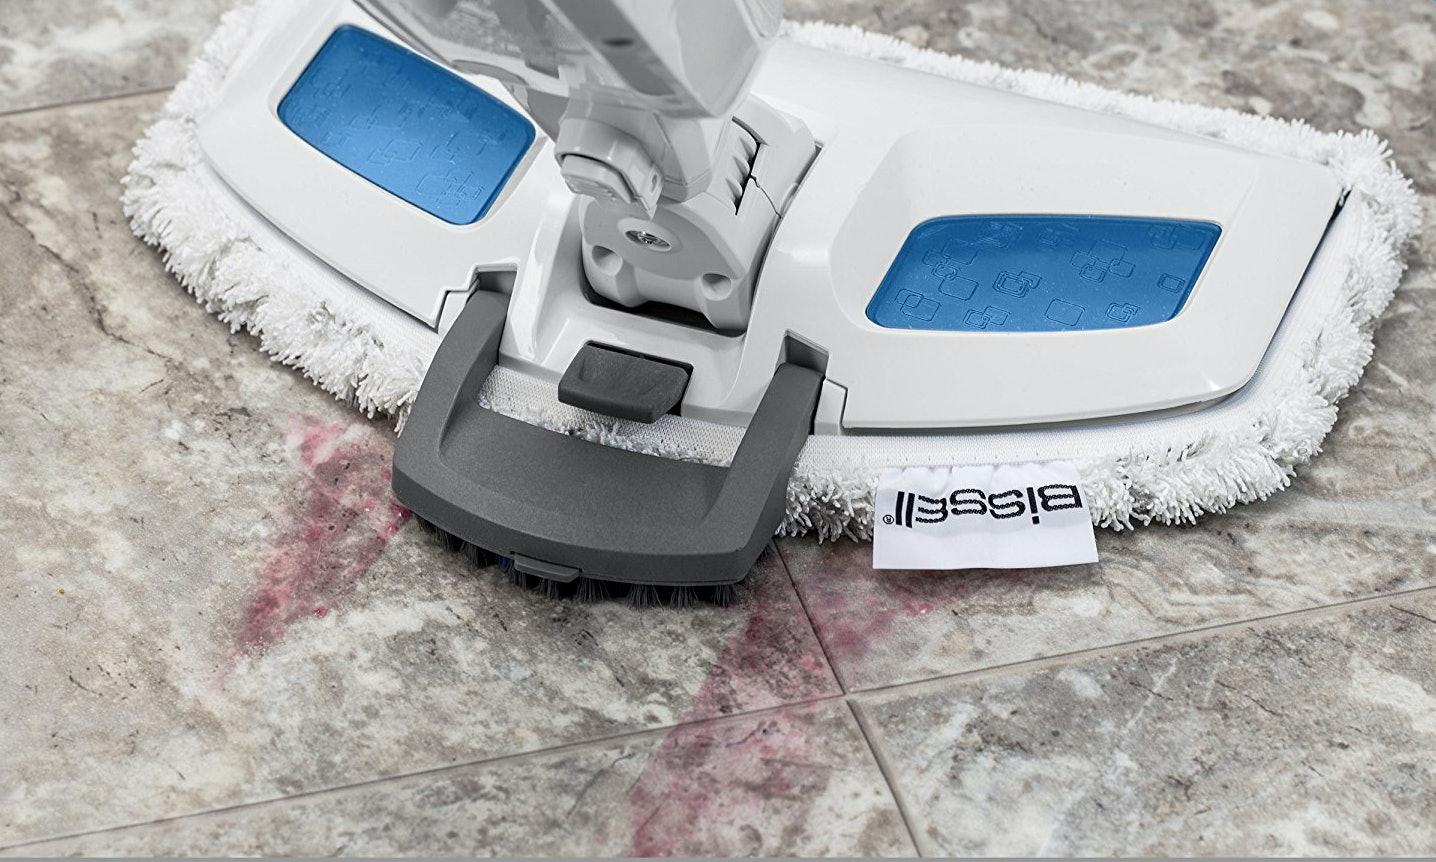 The 4 Best Steam Mops For Tile